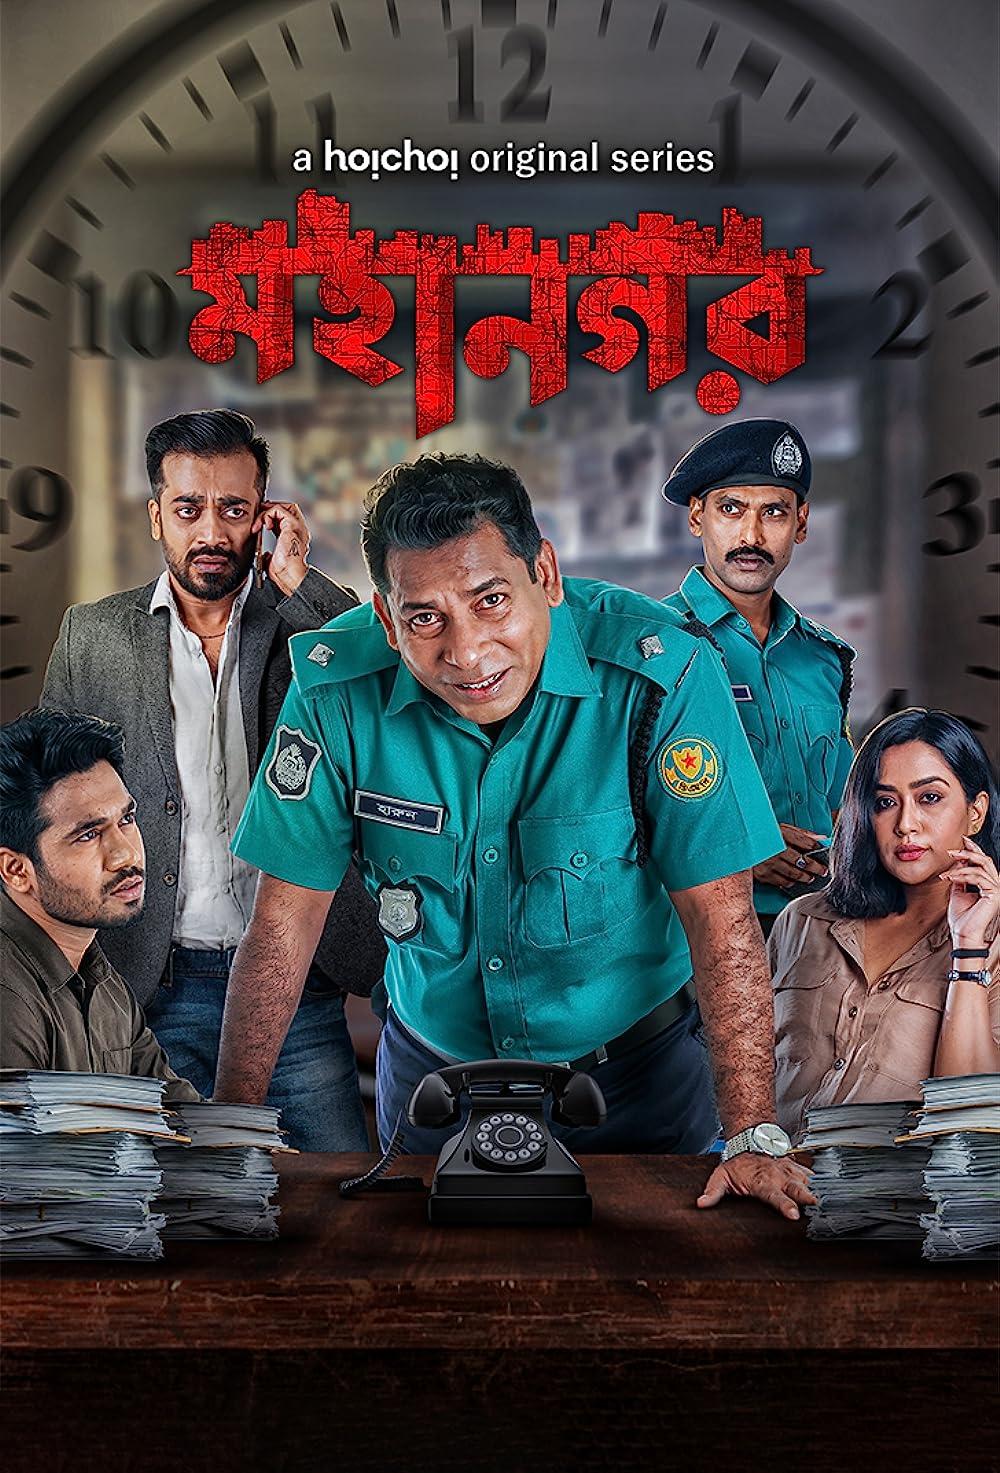 Mohanagar 2021 S01 Bengali Hoichoi Original Complete Web Series 720p HDRip 1.2GB Download